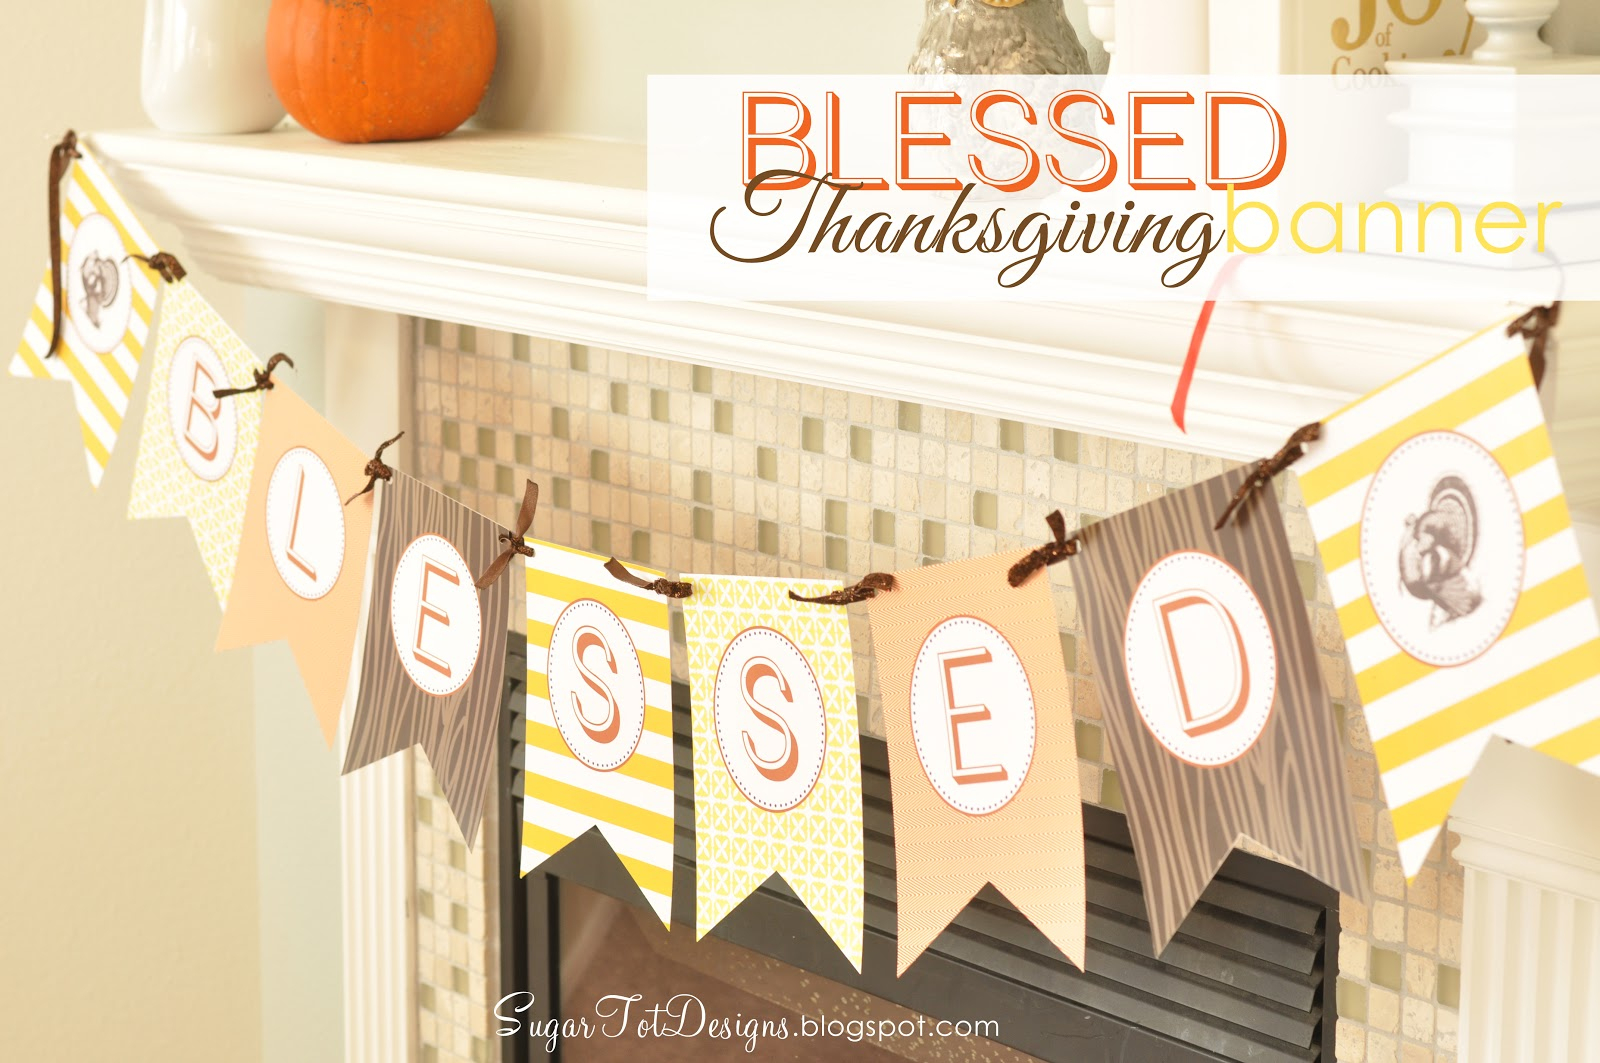 Sugartotdesigns: Blessed Thanksgiving Banner {Free Printable} - Free Printable Happy Thanksgiving Banner